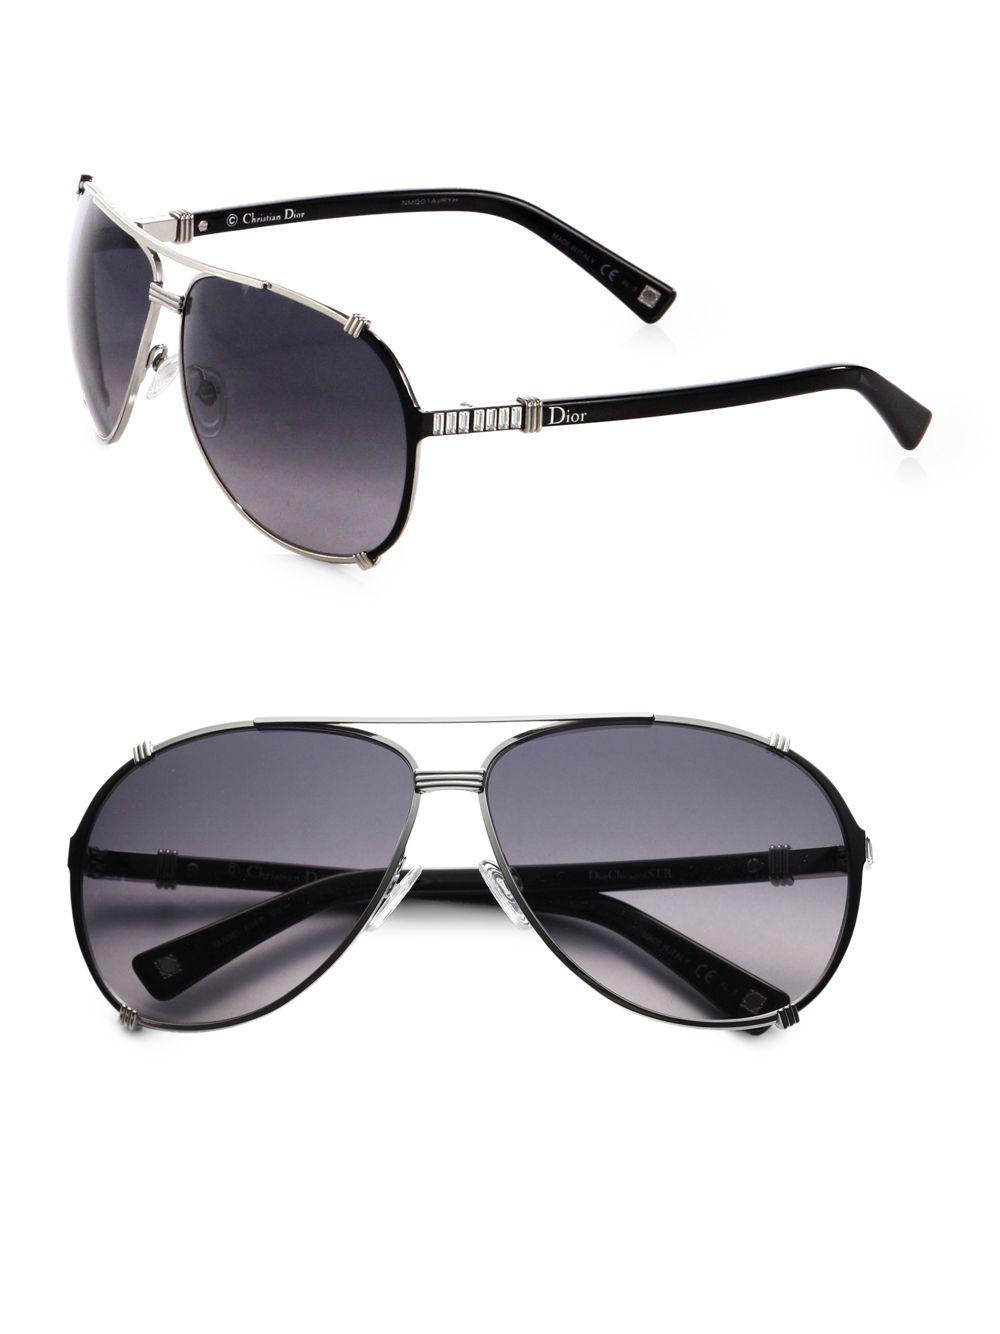 e46b3bf5f81 Lyst - Dior Chicago 63mm Metal Aviator Sunglasses in Black